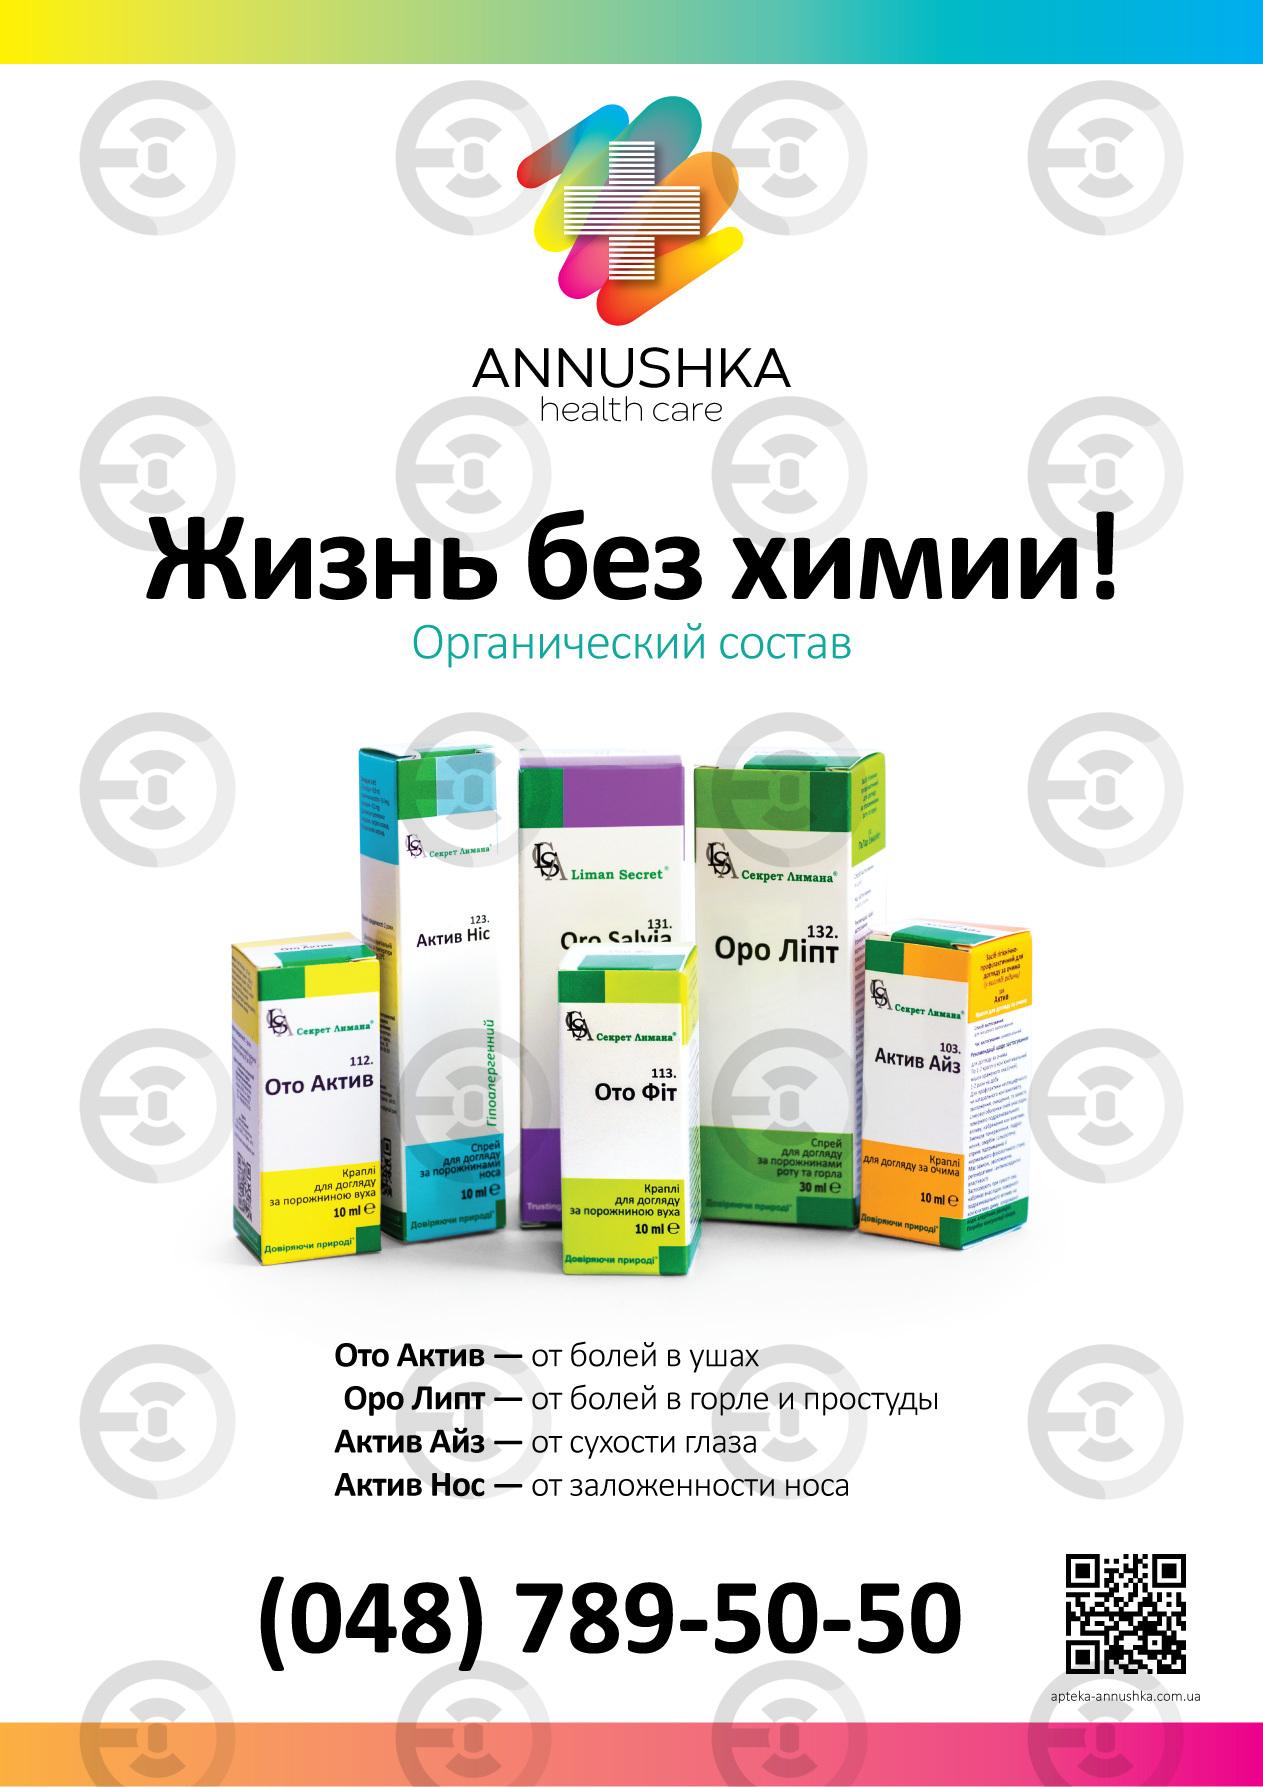 apteka-annushka_A3_01.jpg